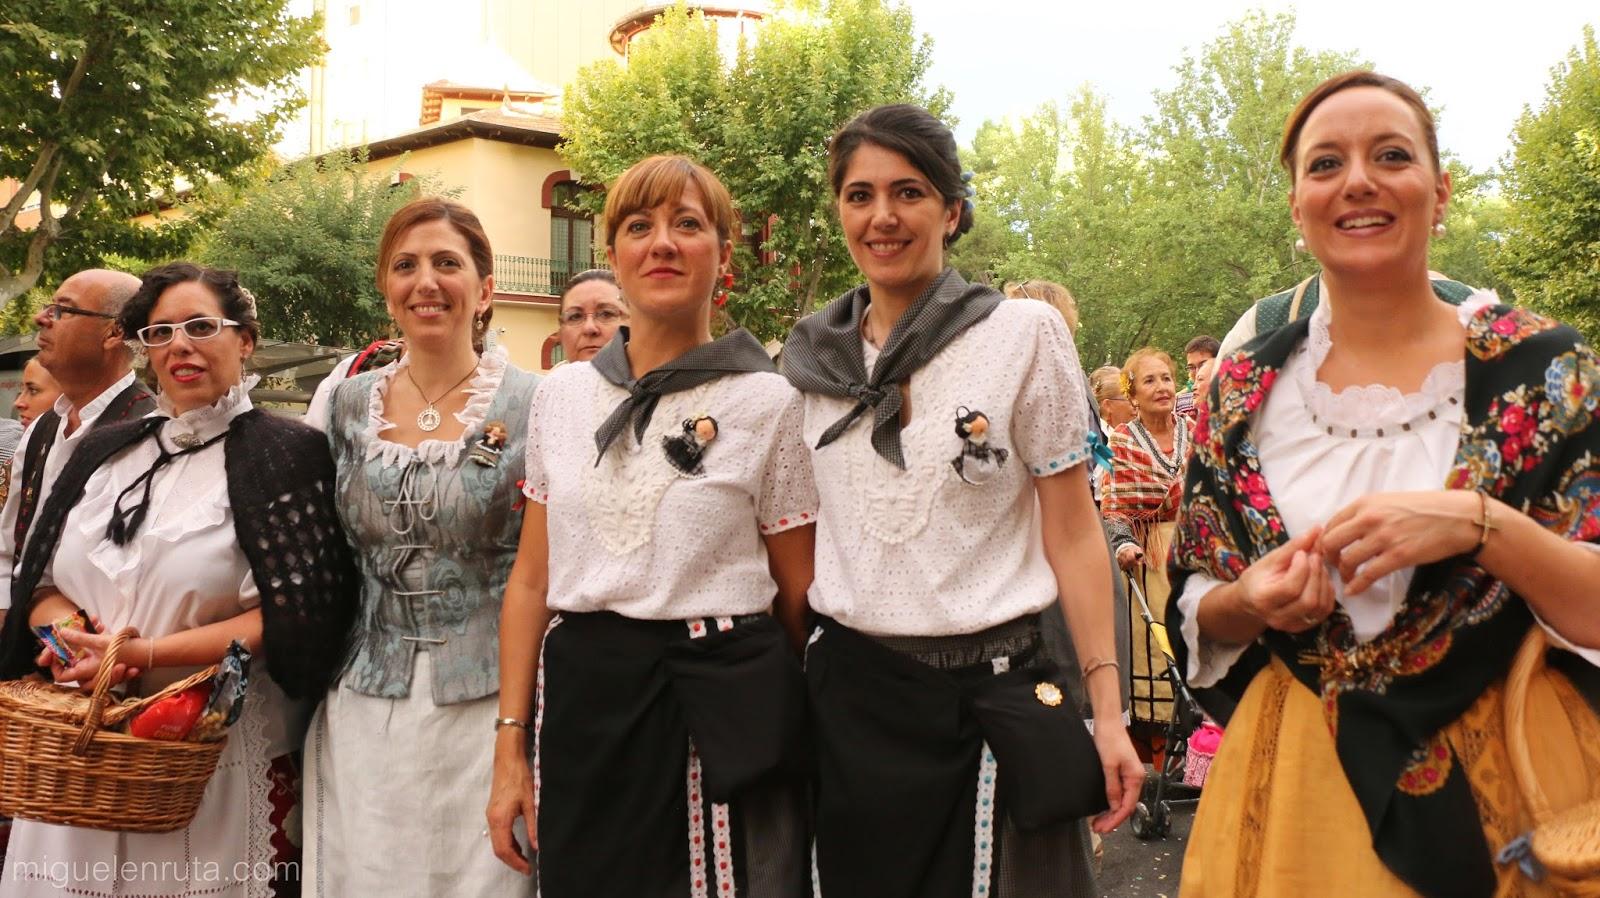 Fotos-retratos-Feria-de-Albacete_7